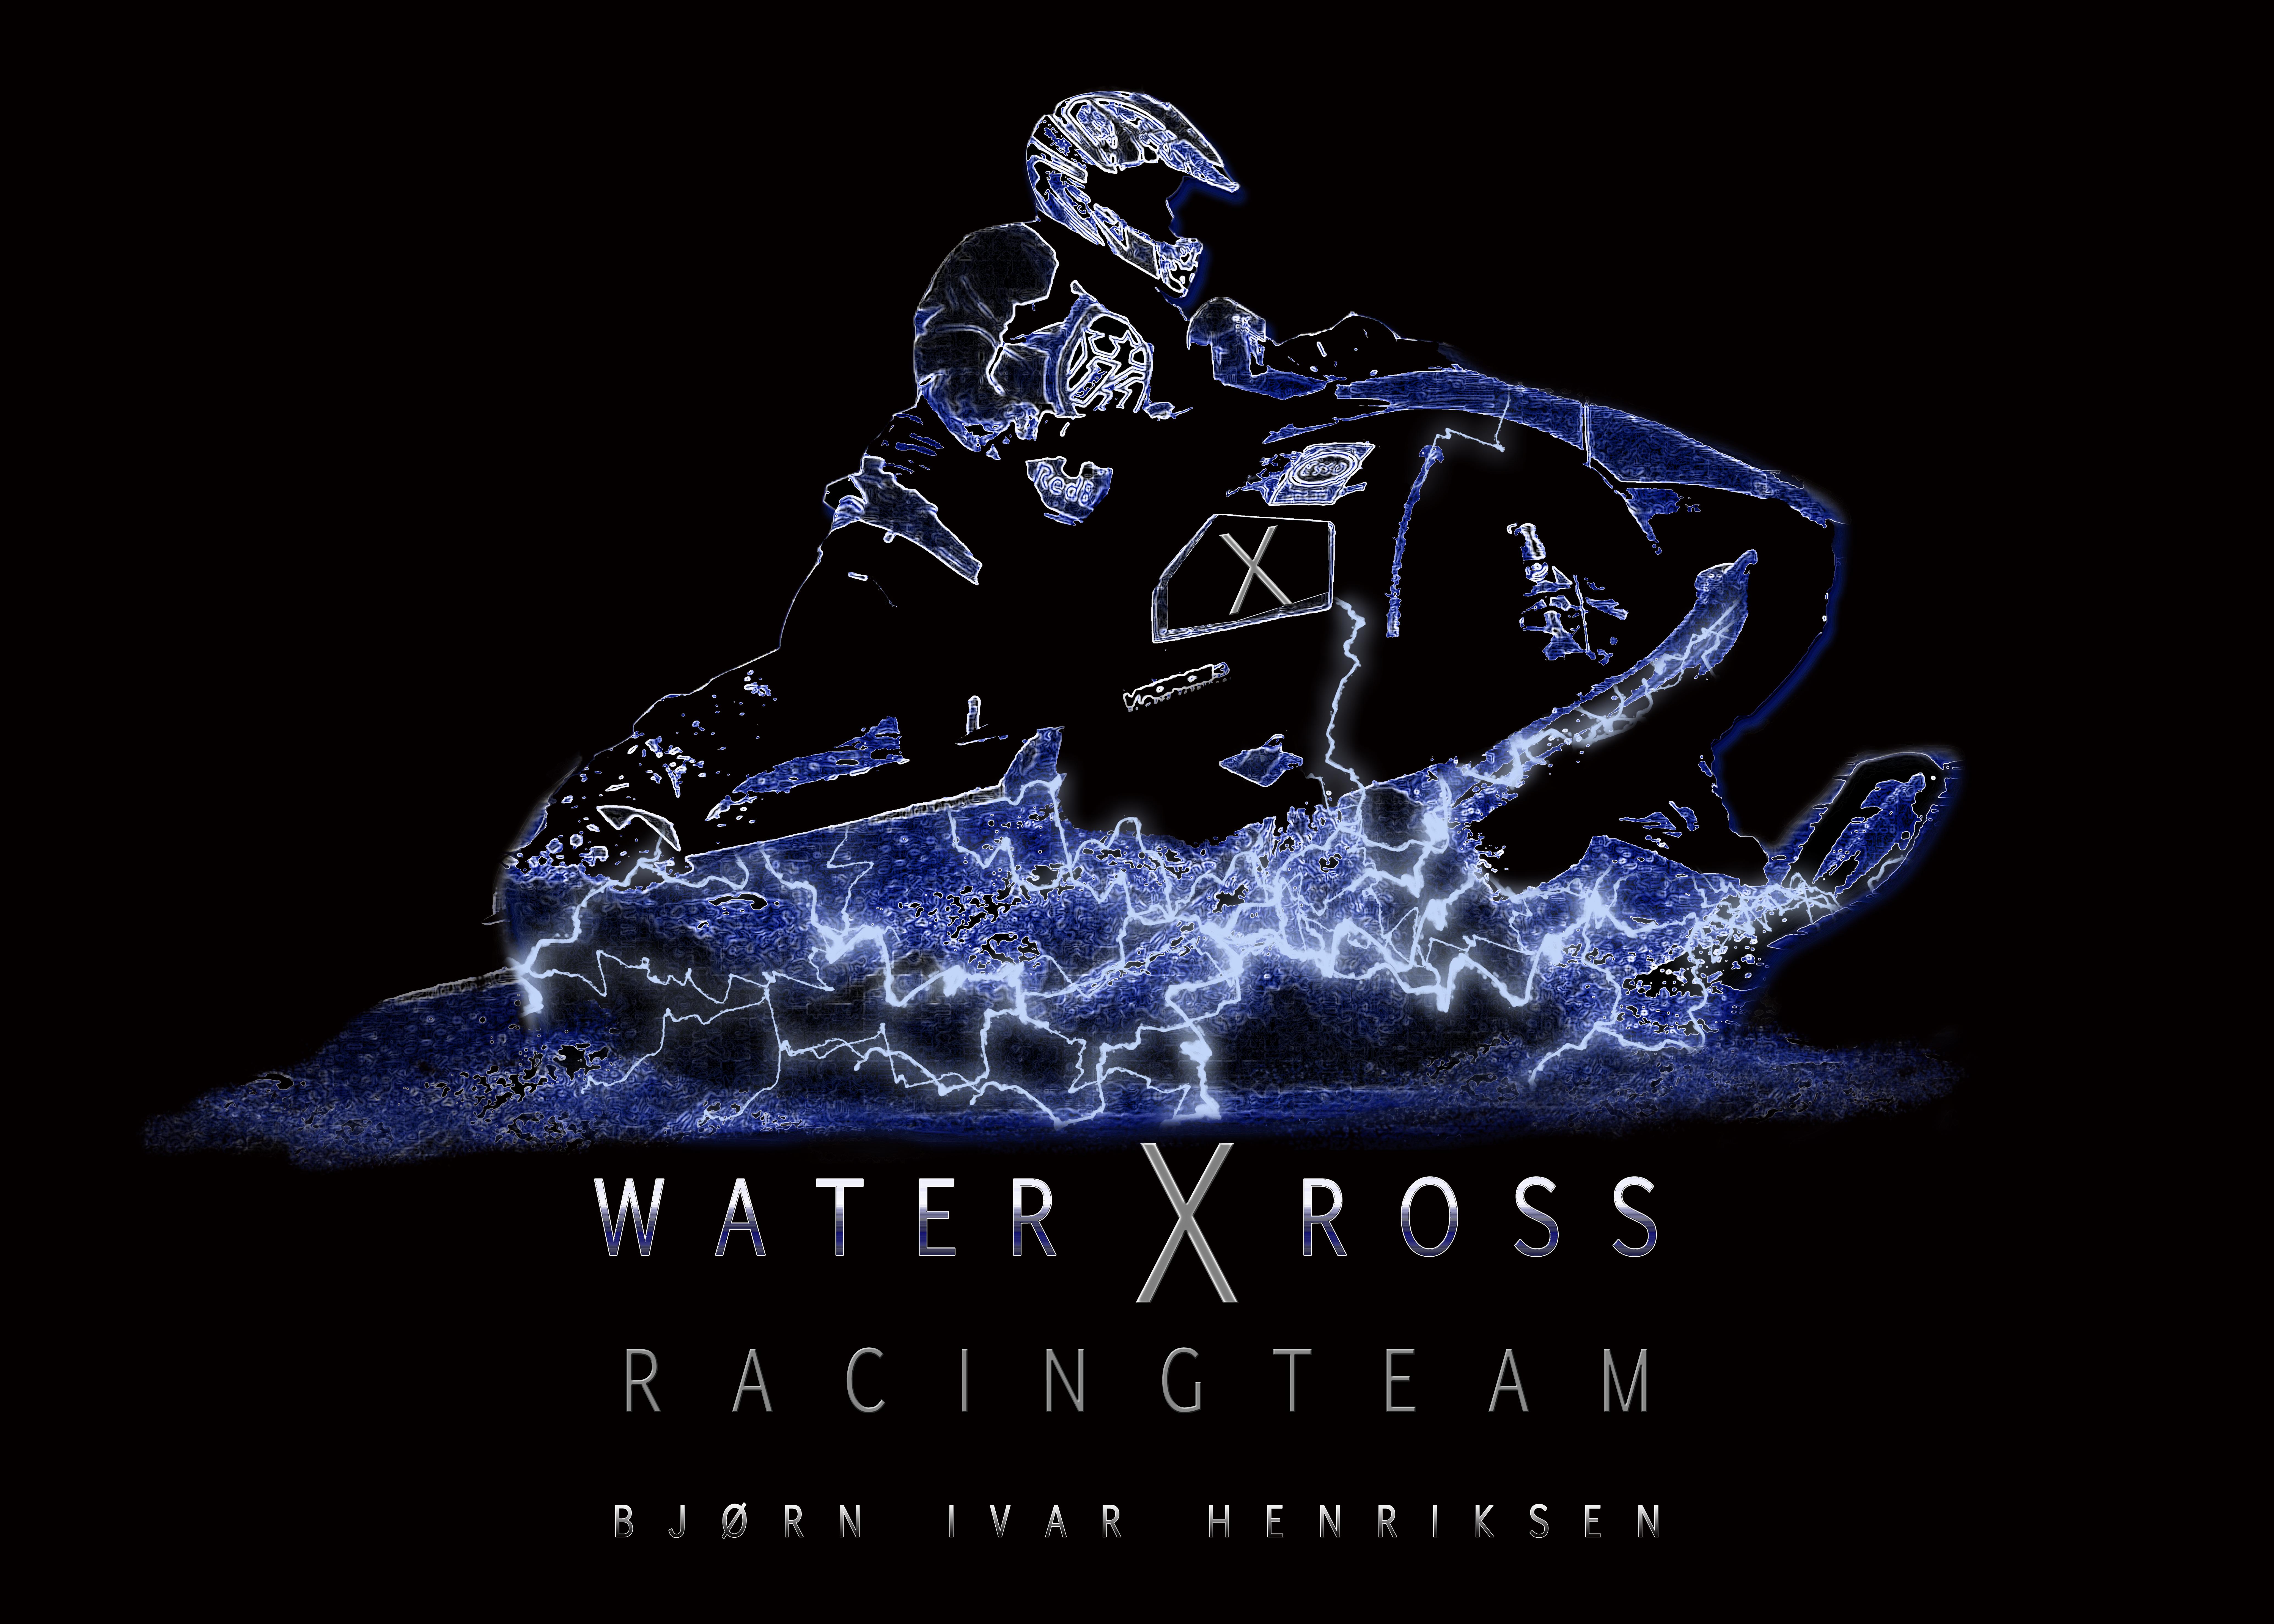 Logo Waterxross racingteam